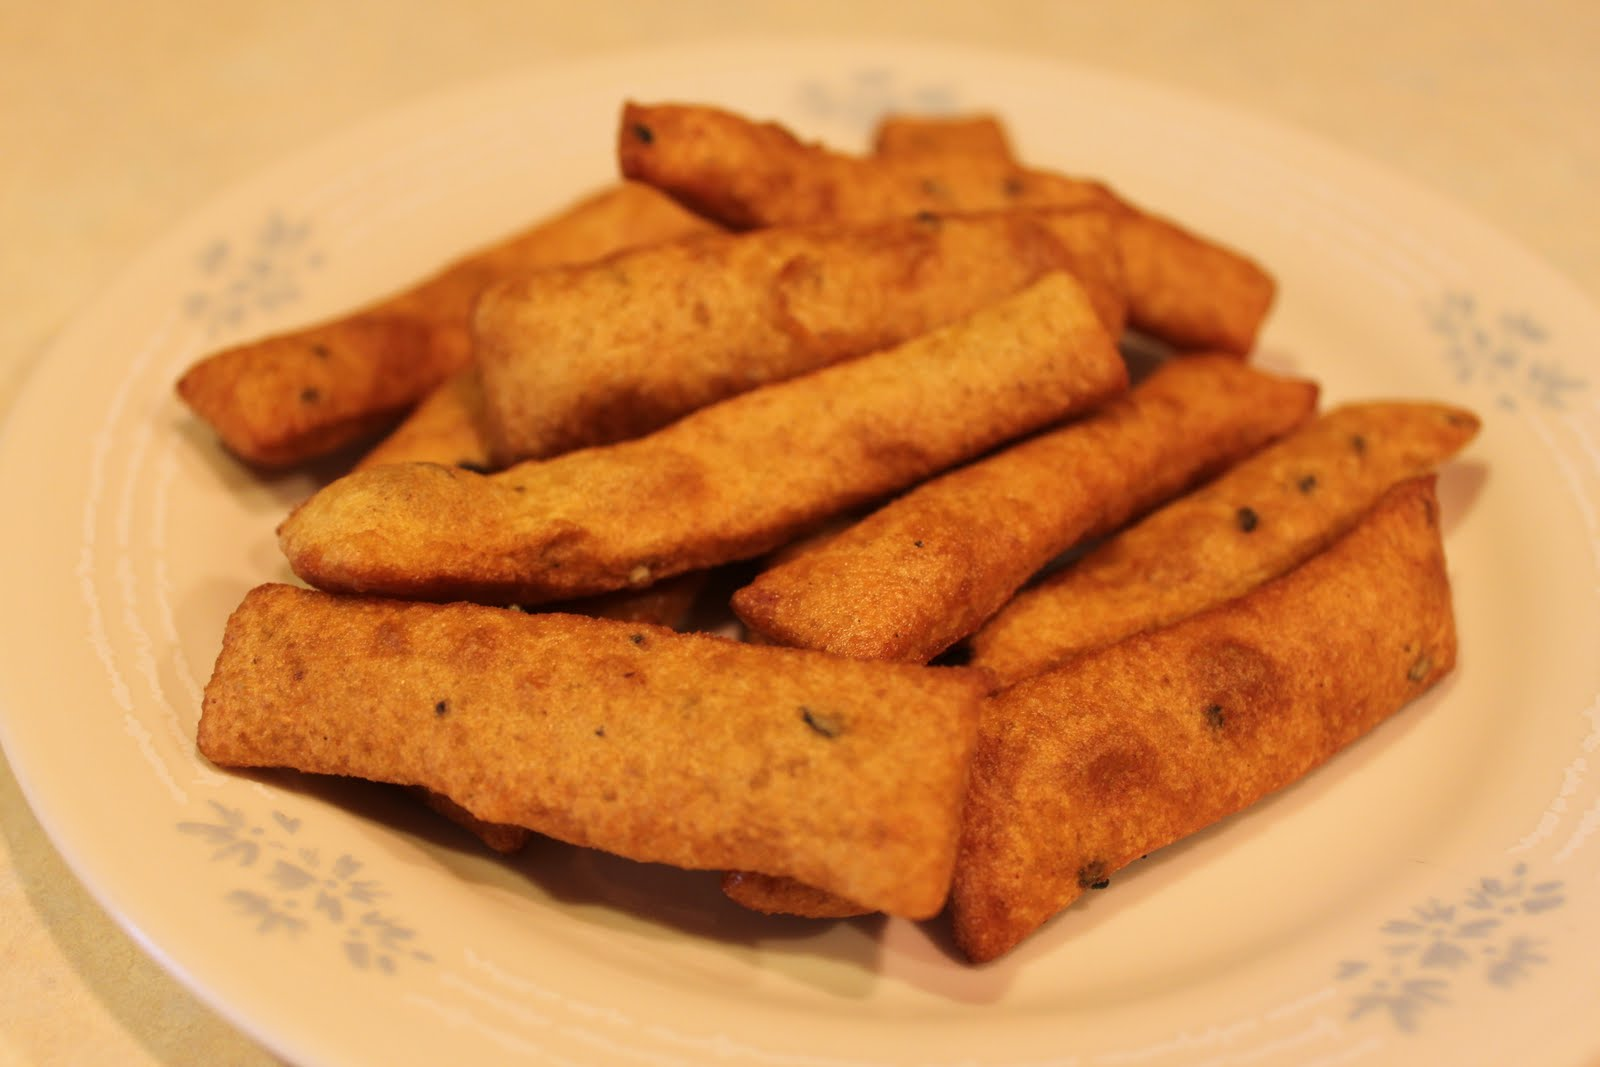 Vitamix High-End Blenders Reviews: Whole Wheat Sweet Potato Sticks